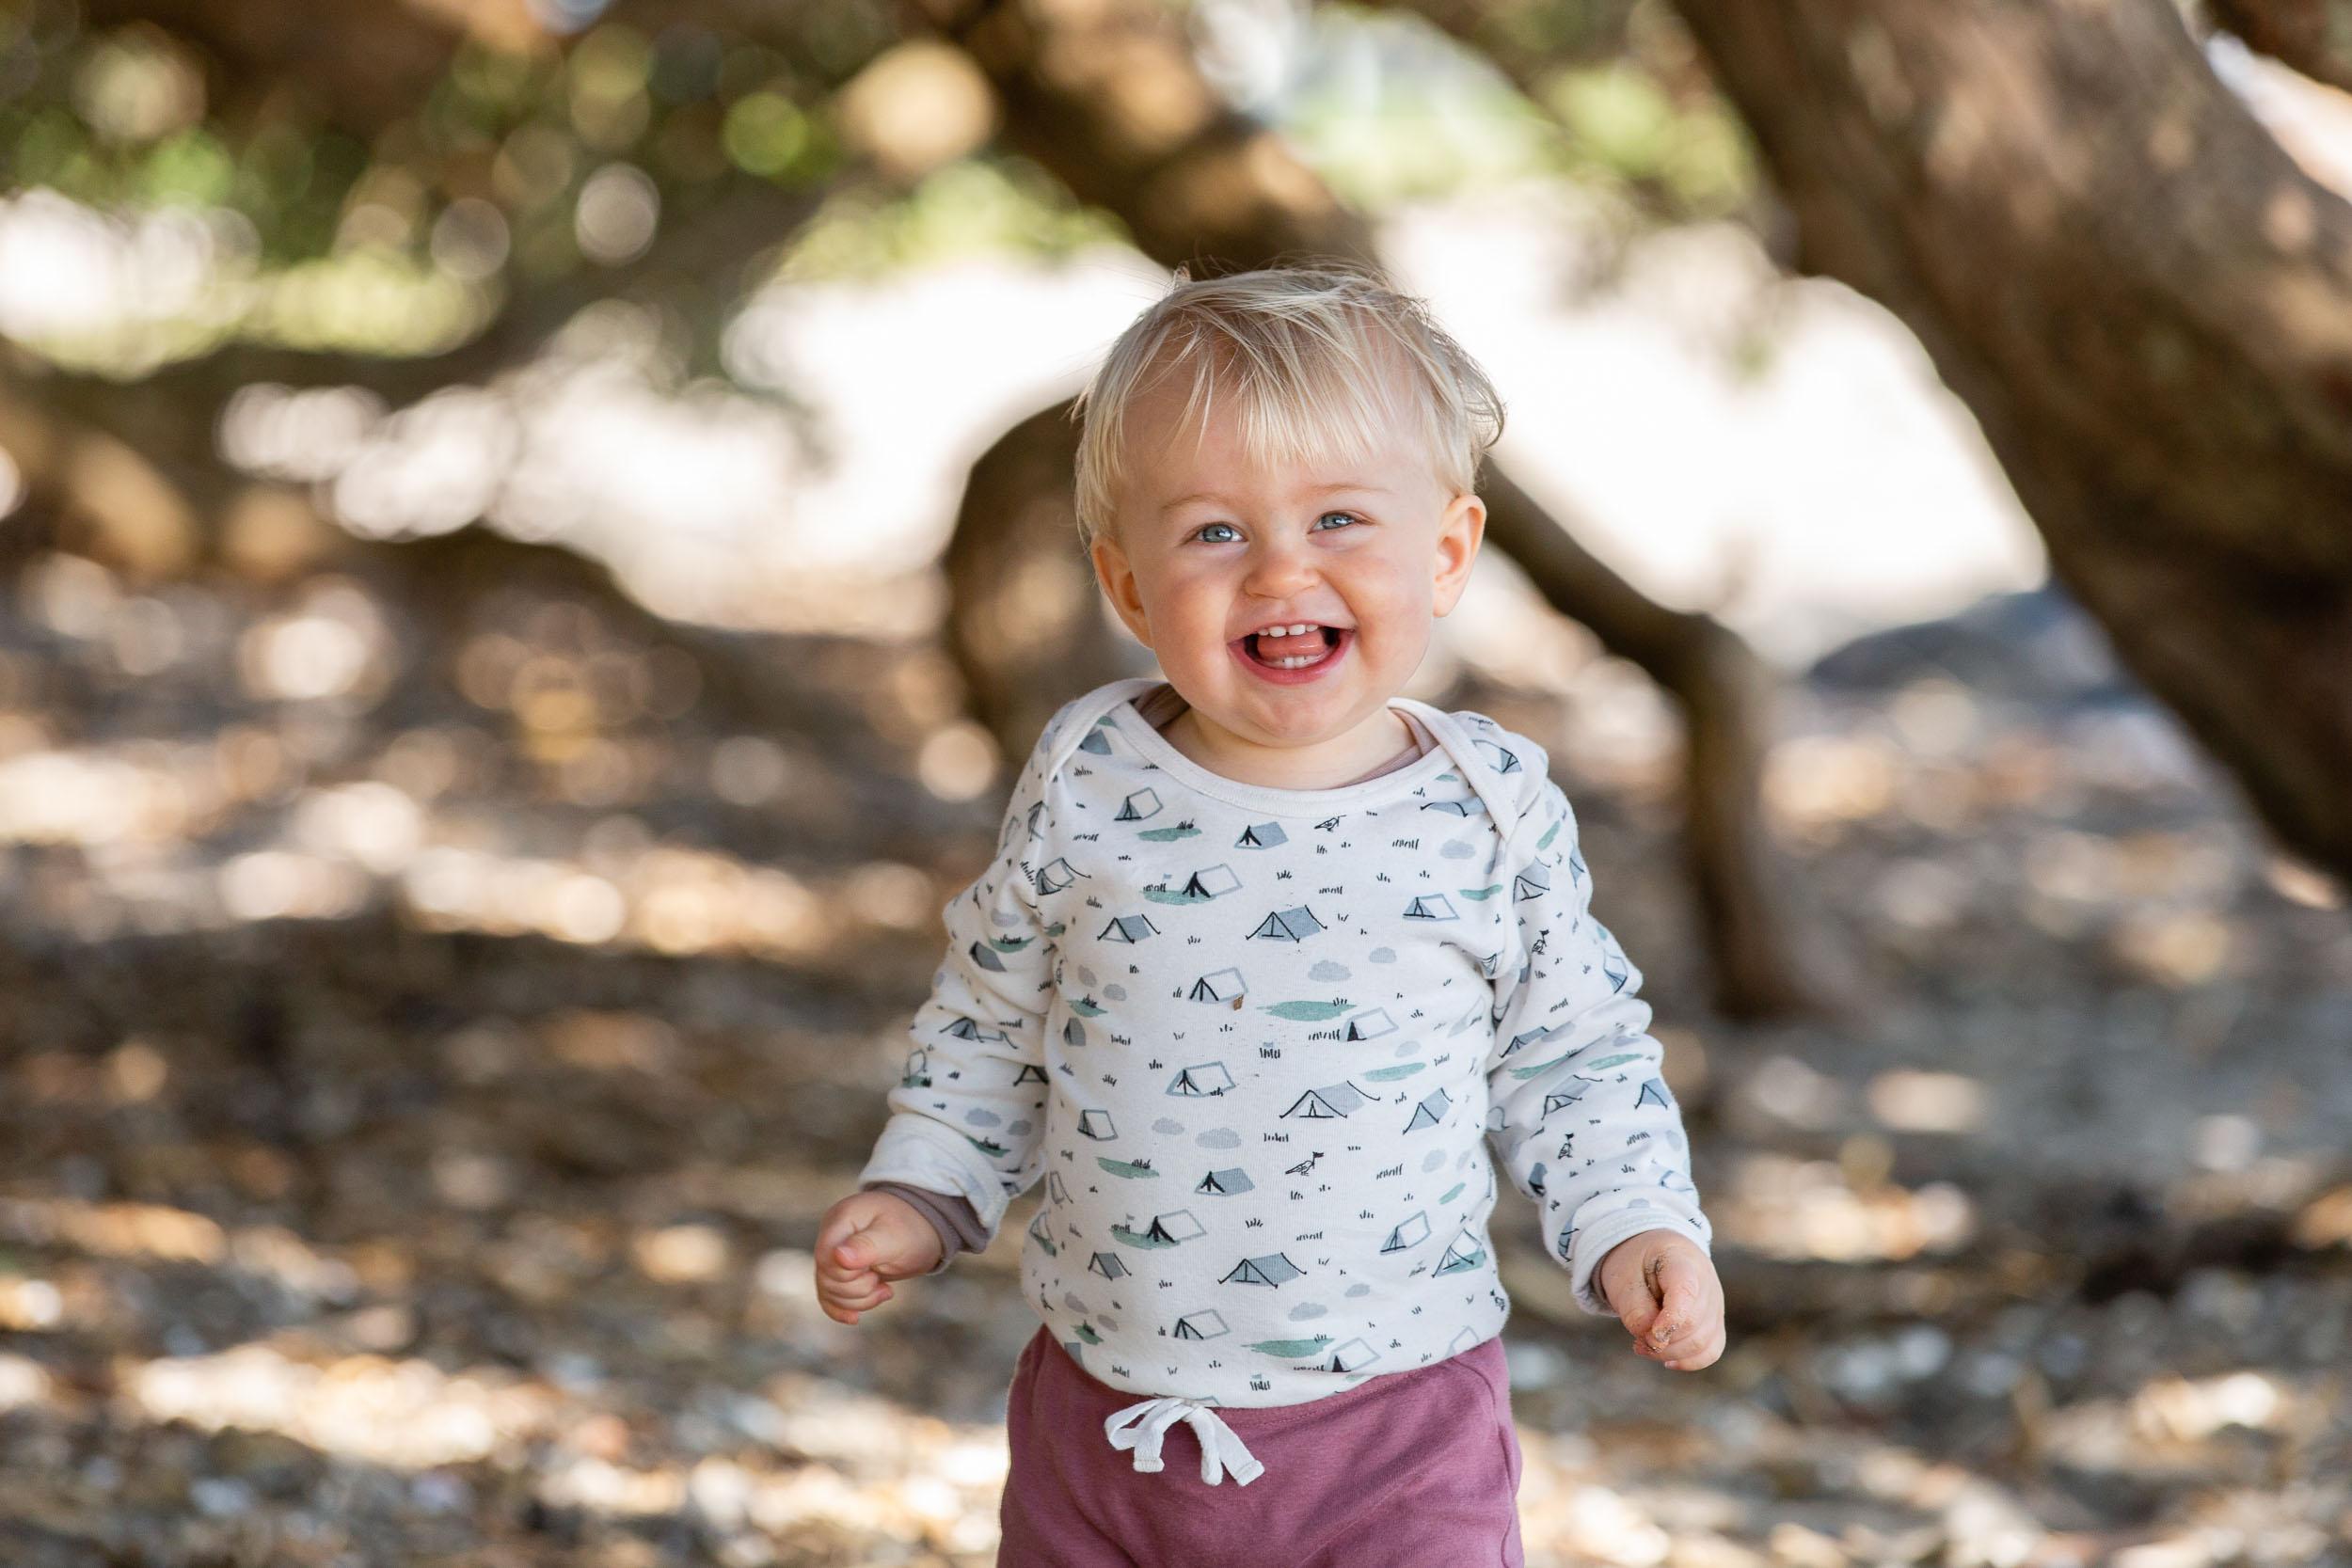 Aucklandfamilyphotographer (4 of 14).jpg